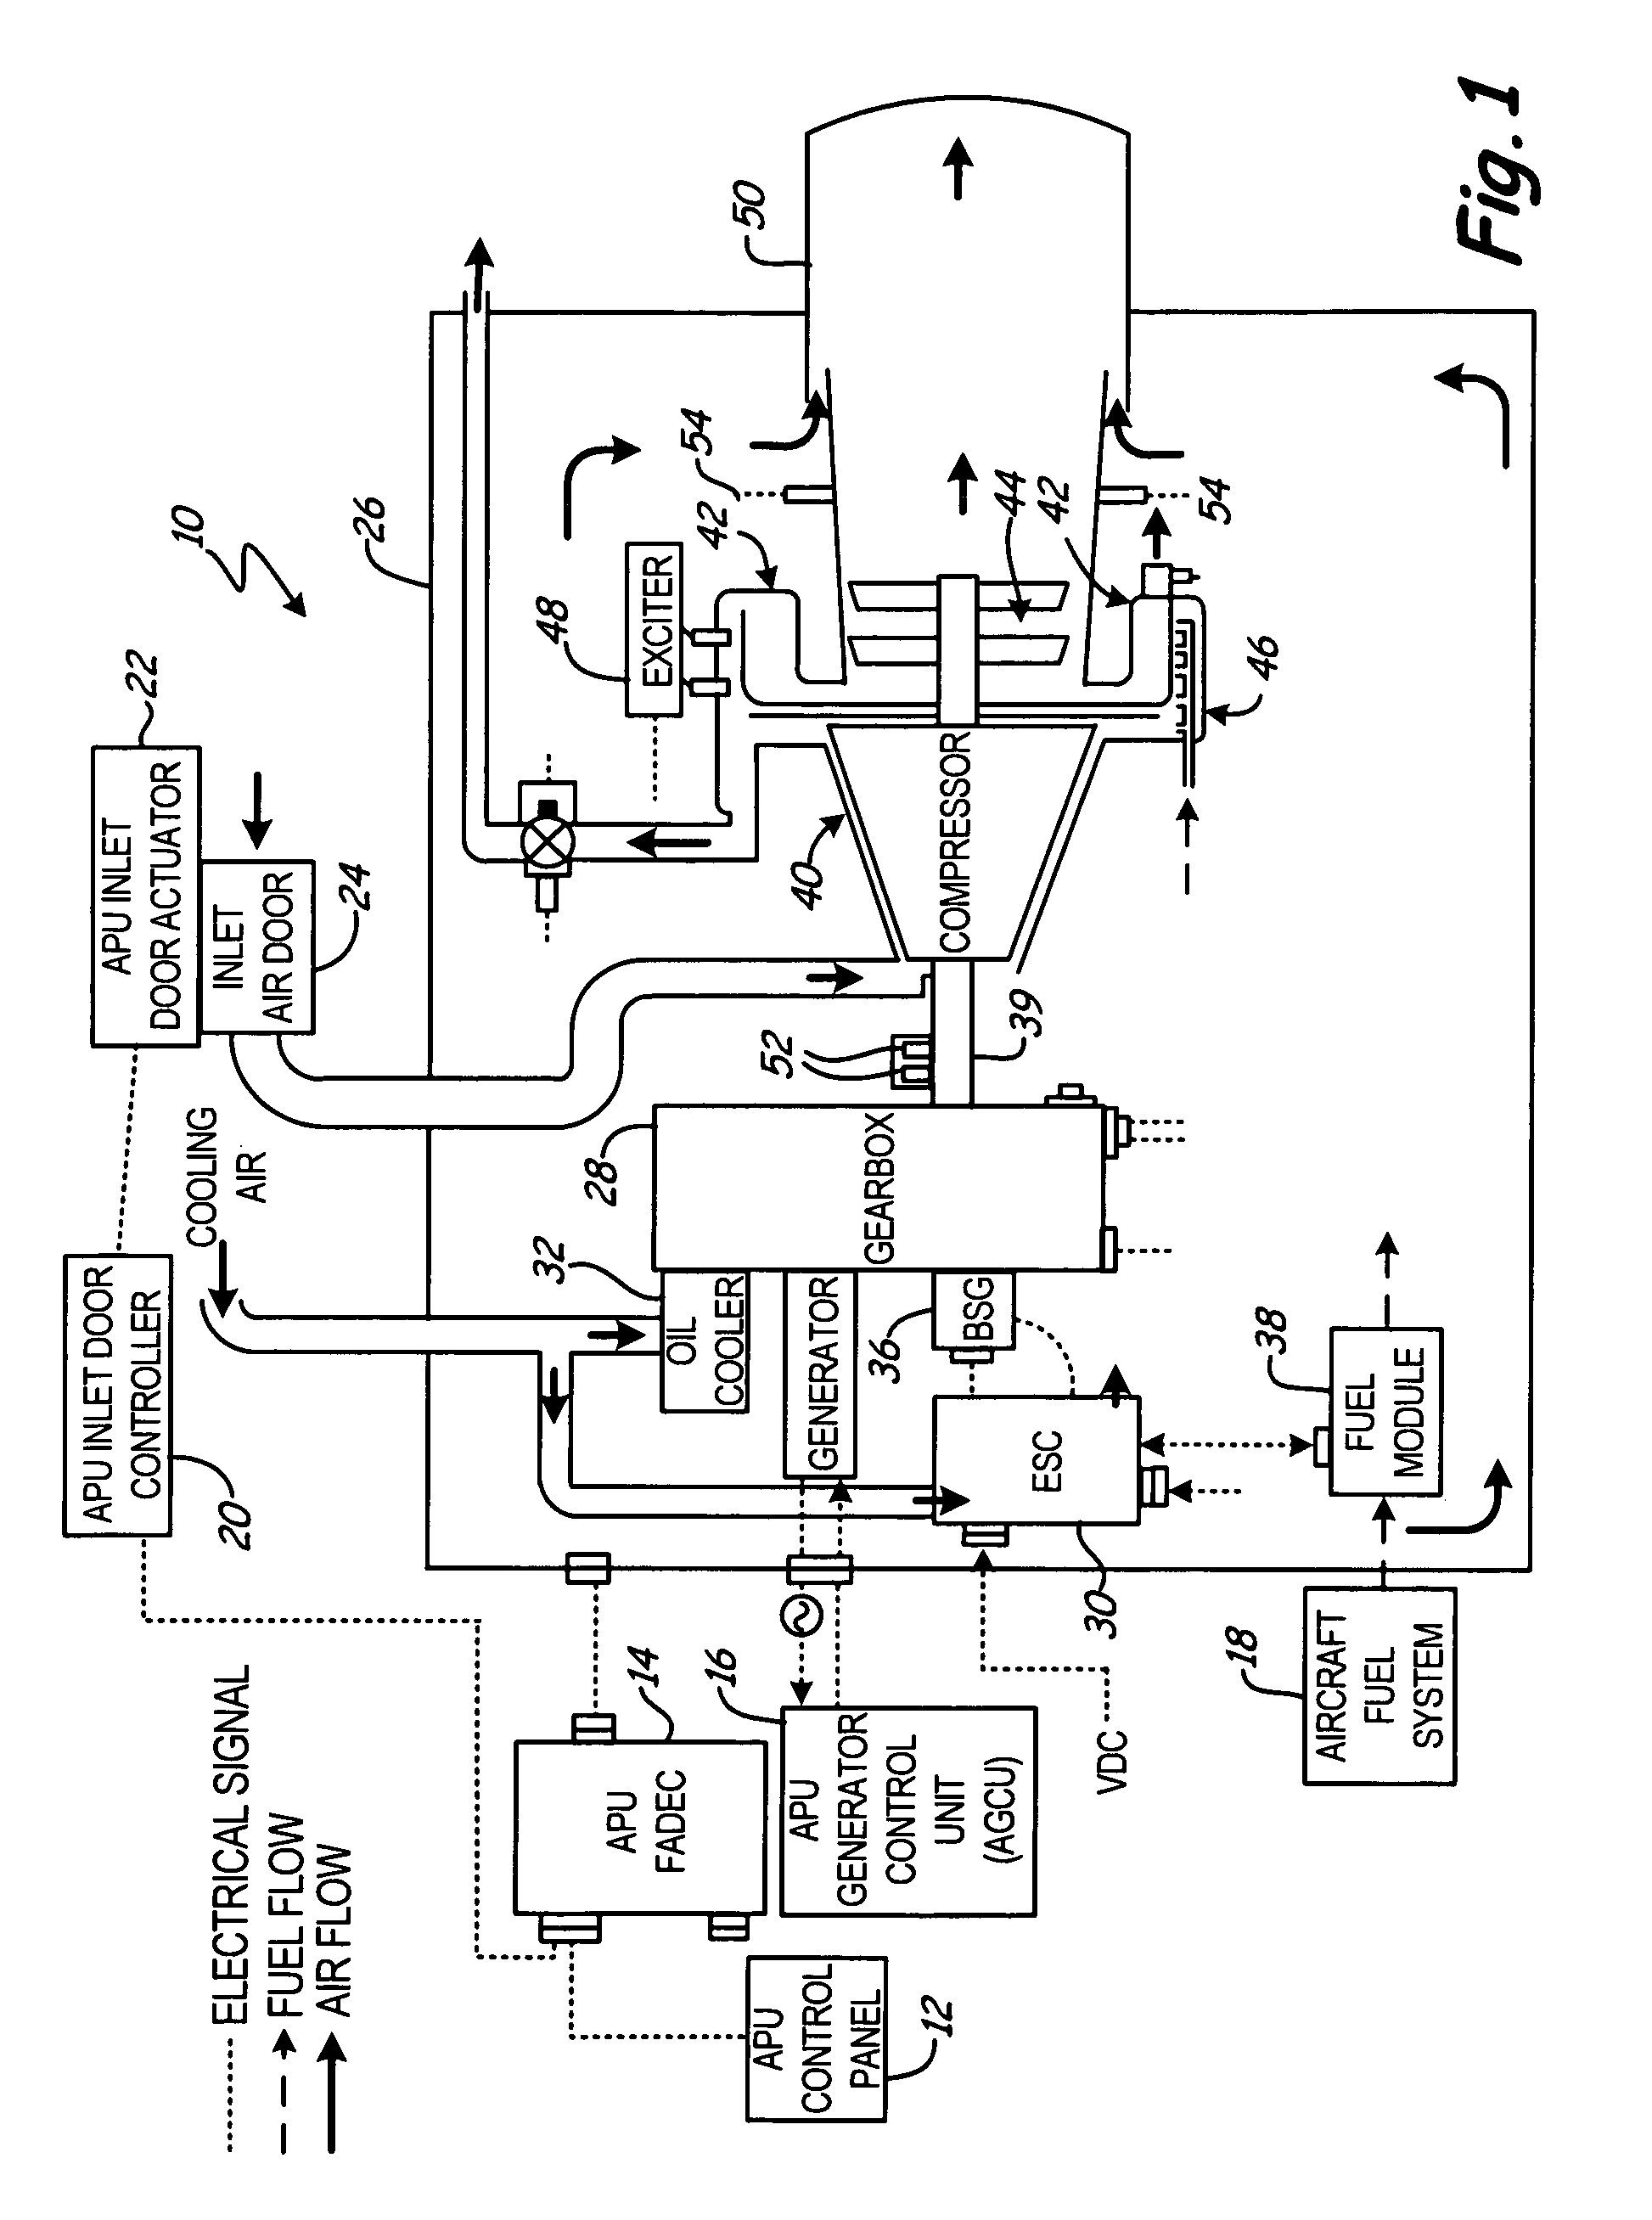 Unique northstar Generator Wiring Diagram diagram